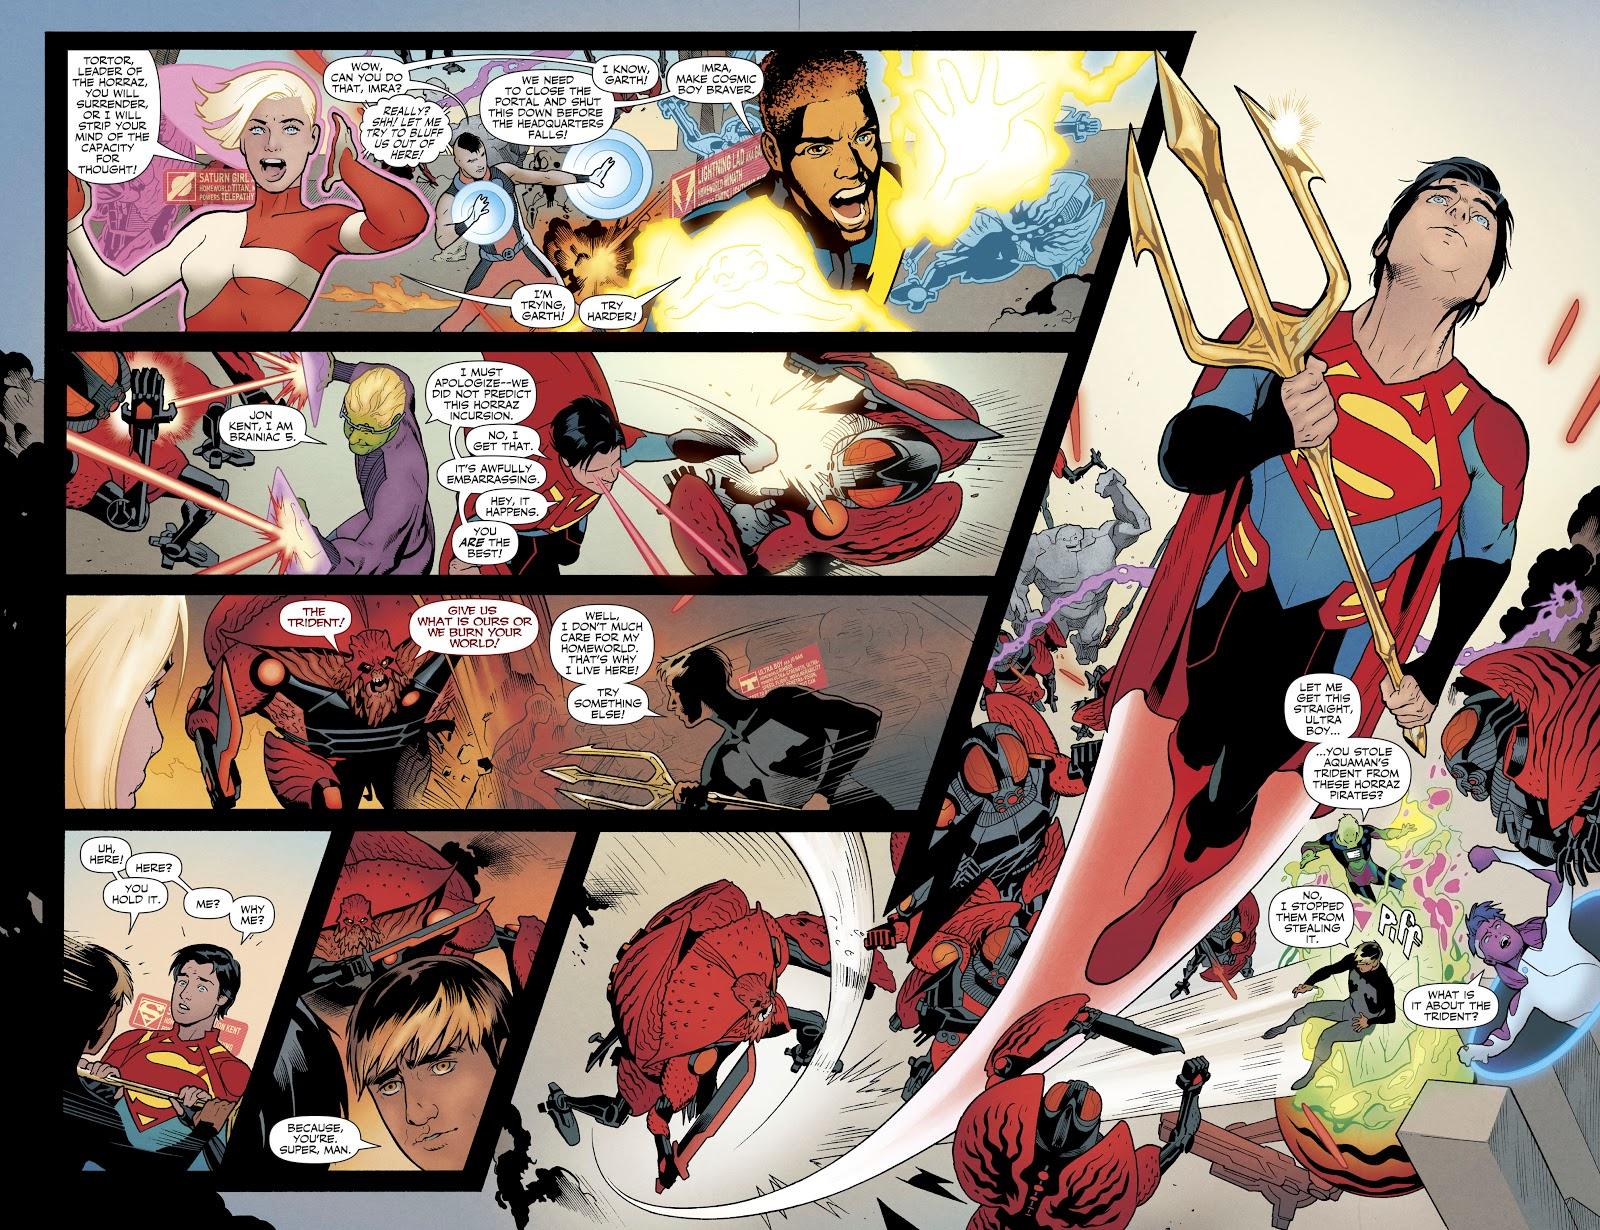 Legion of Super-Heroes Millennium review